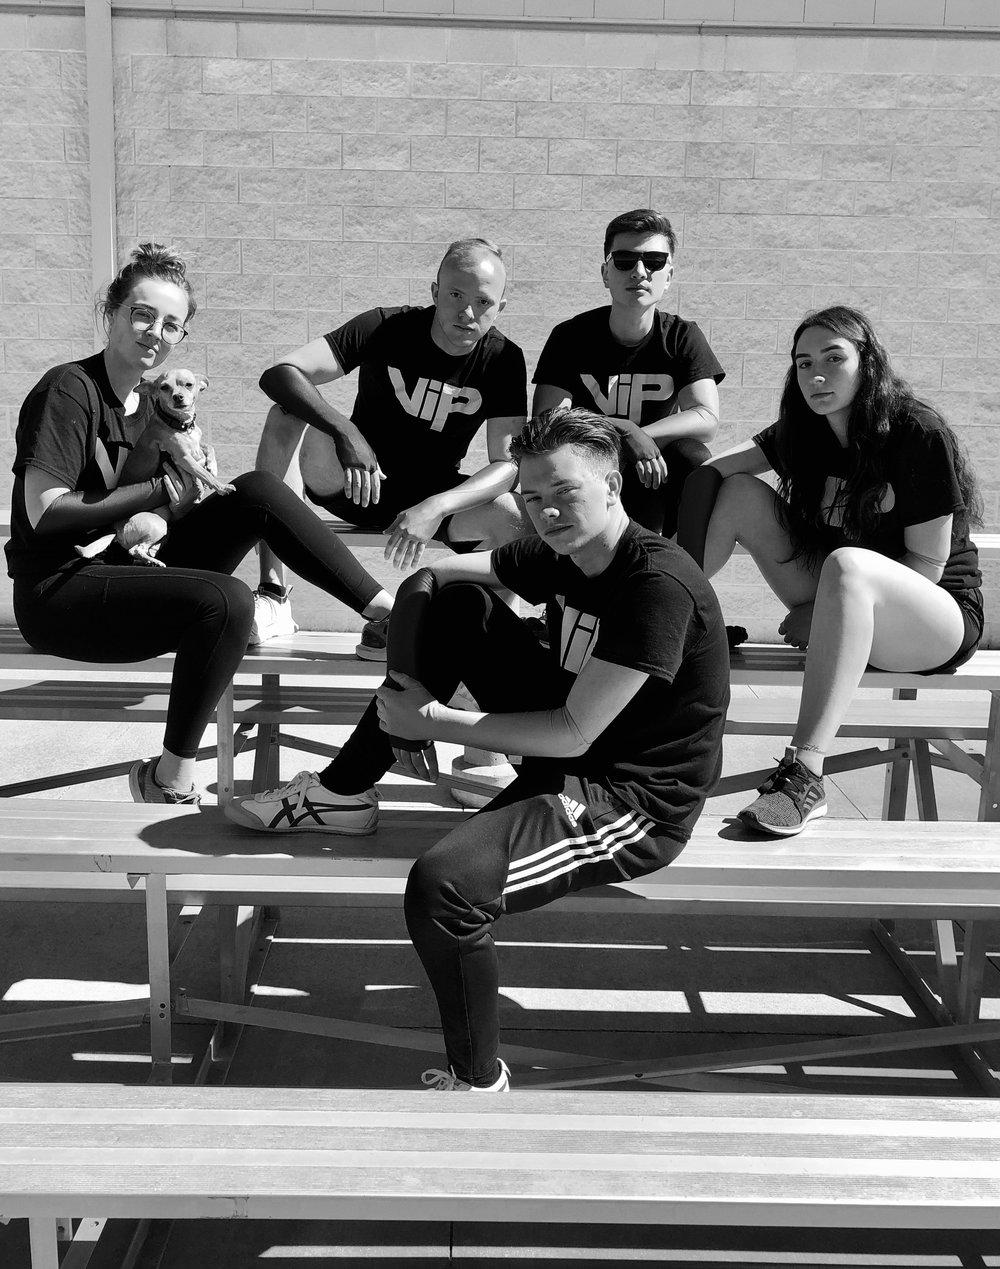 Cymbals - Collin Vaughn, Peyton Alexander, Chance Leverett, Payton Vincent, Dayne Corrallo